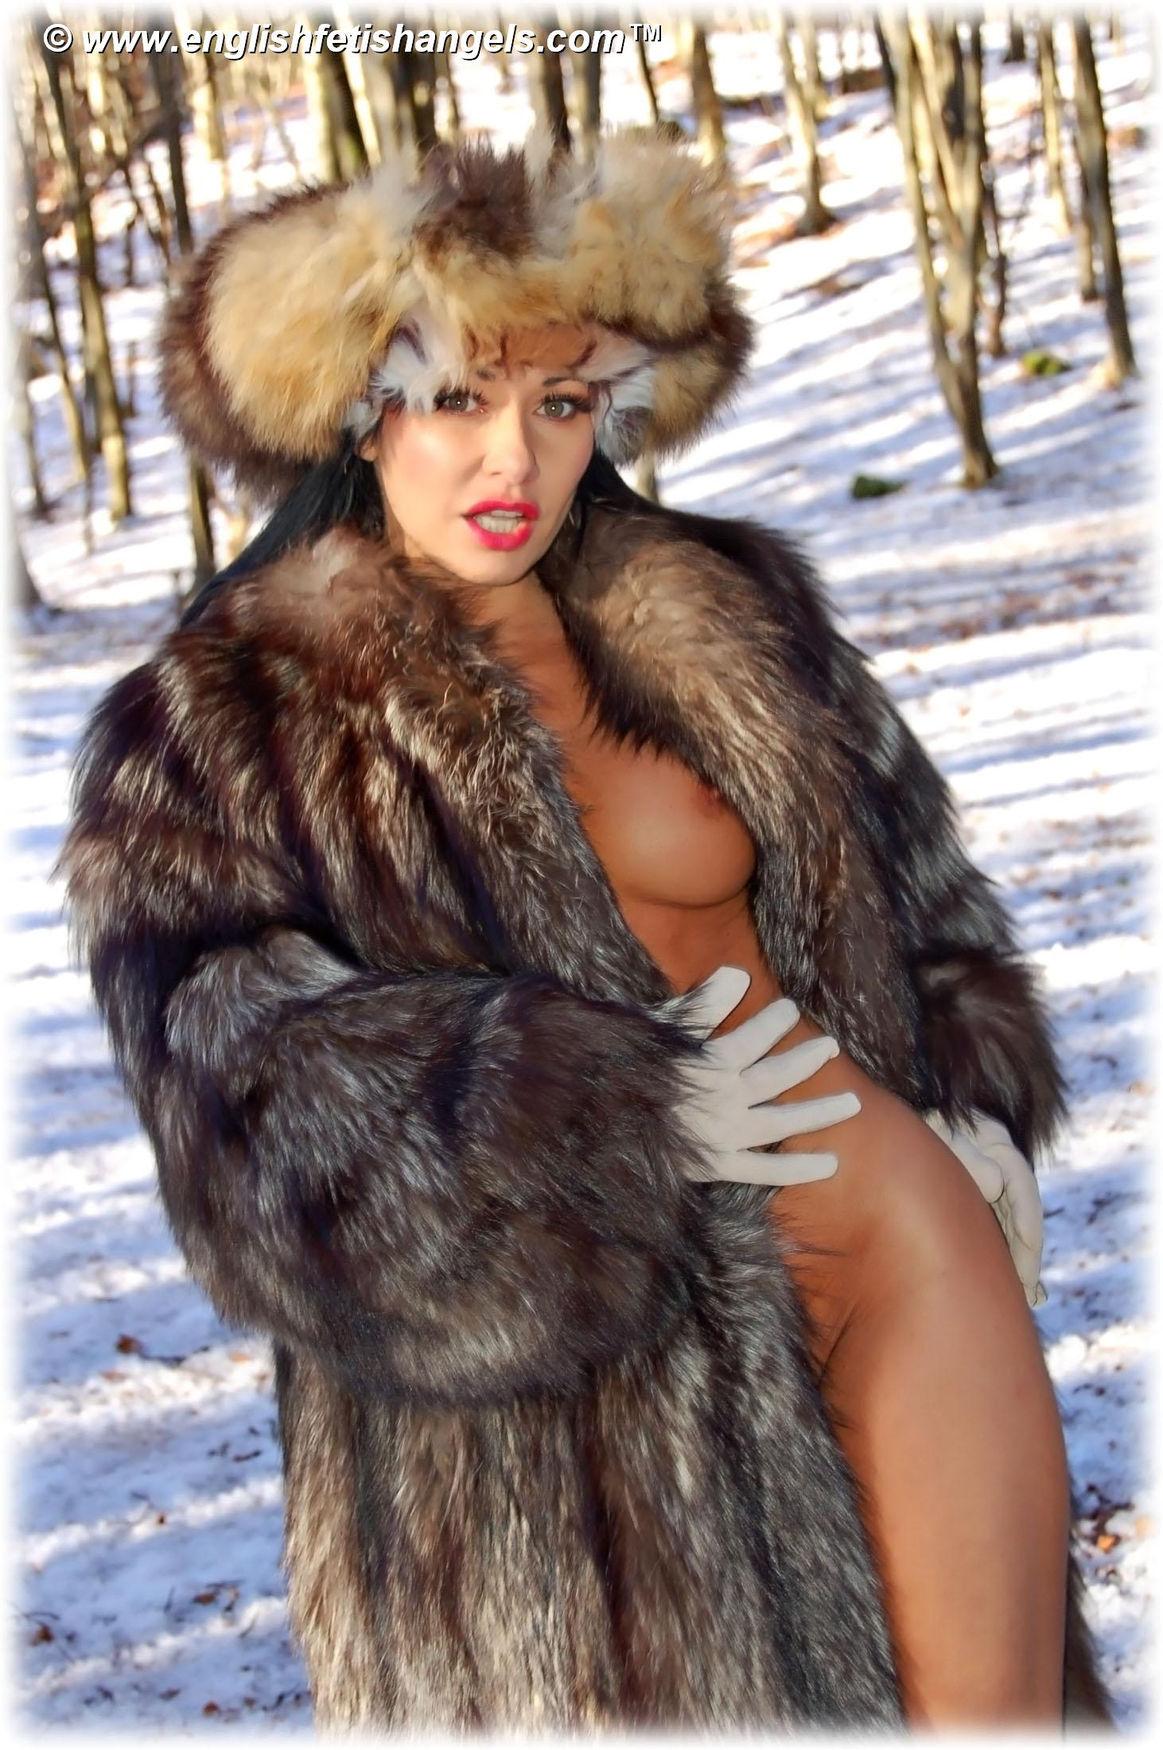 Fur mature women sexy, pornstar explosive creampie